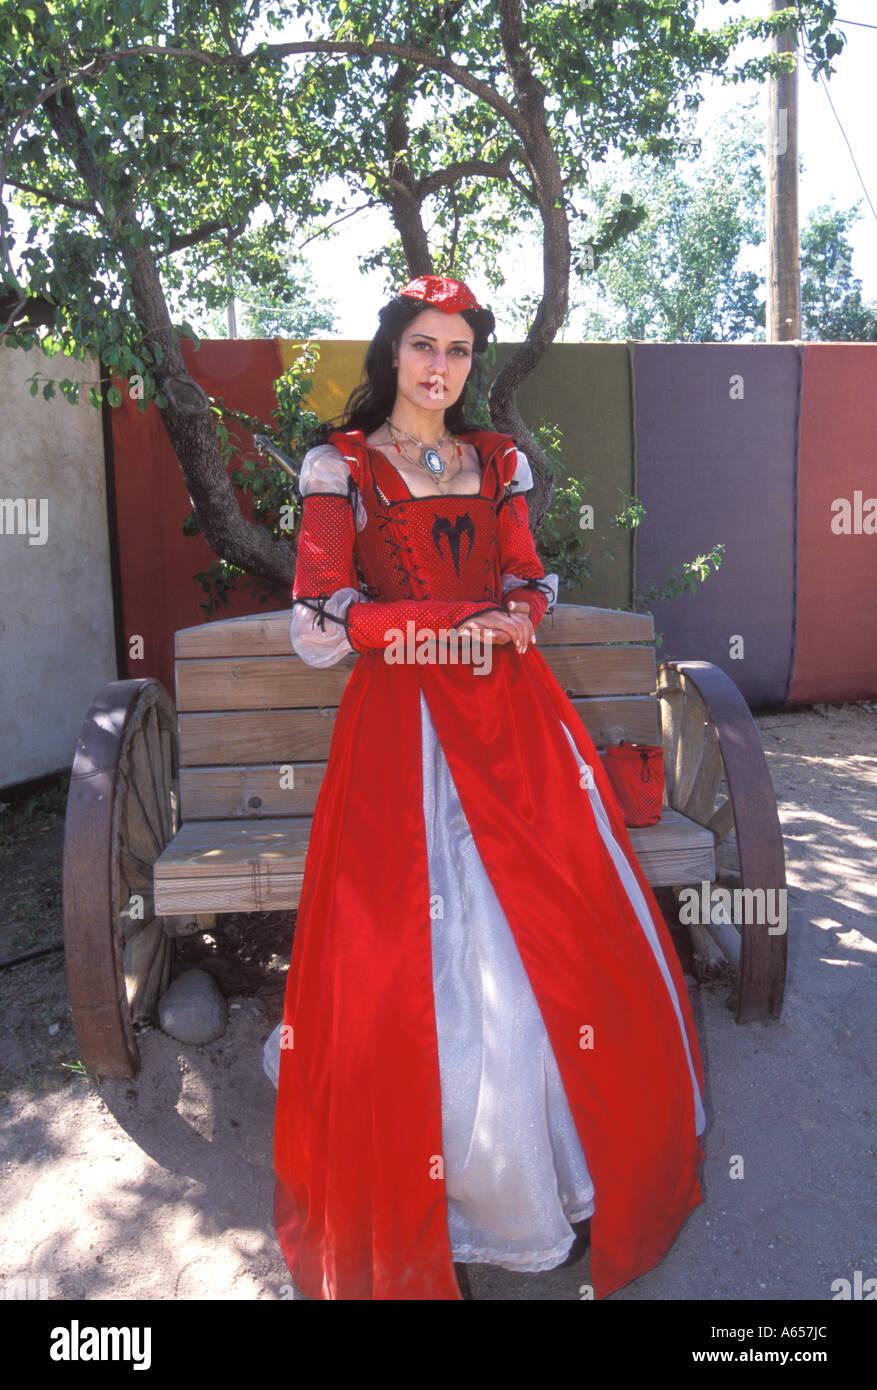 Die Renaissance Vergnügen Faire Glen Helen Park San Bernardino California Vereinigte Staaten Stockbild